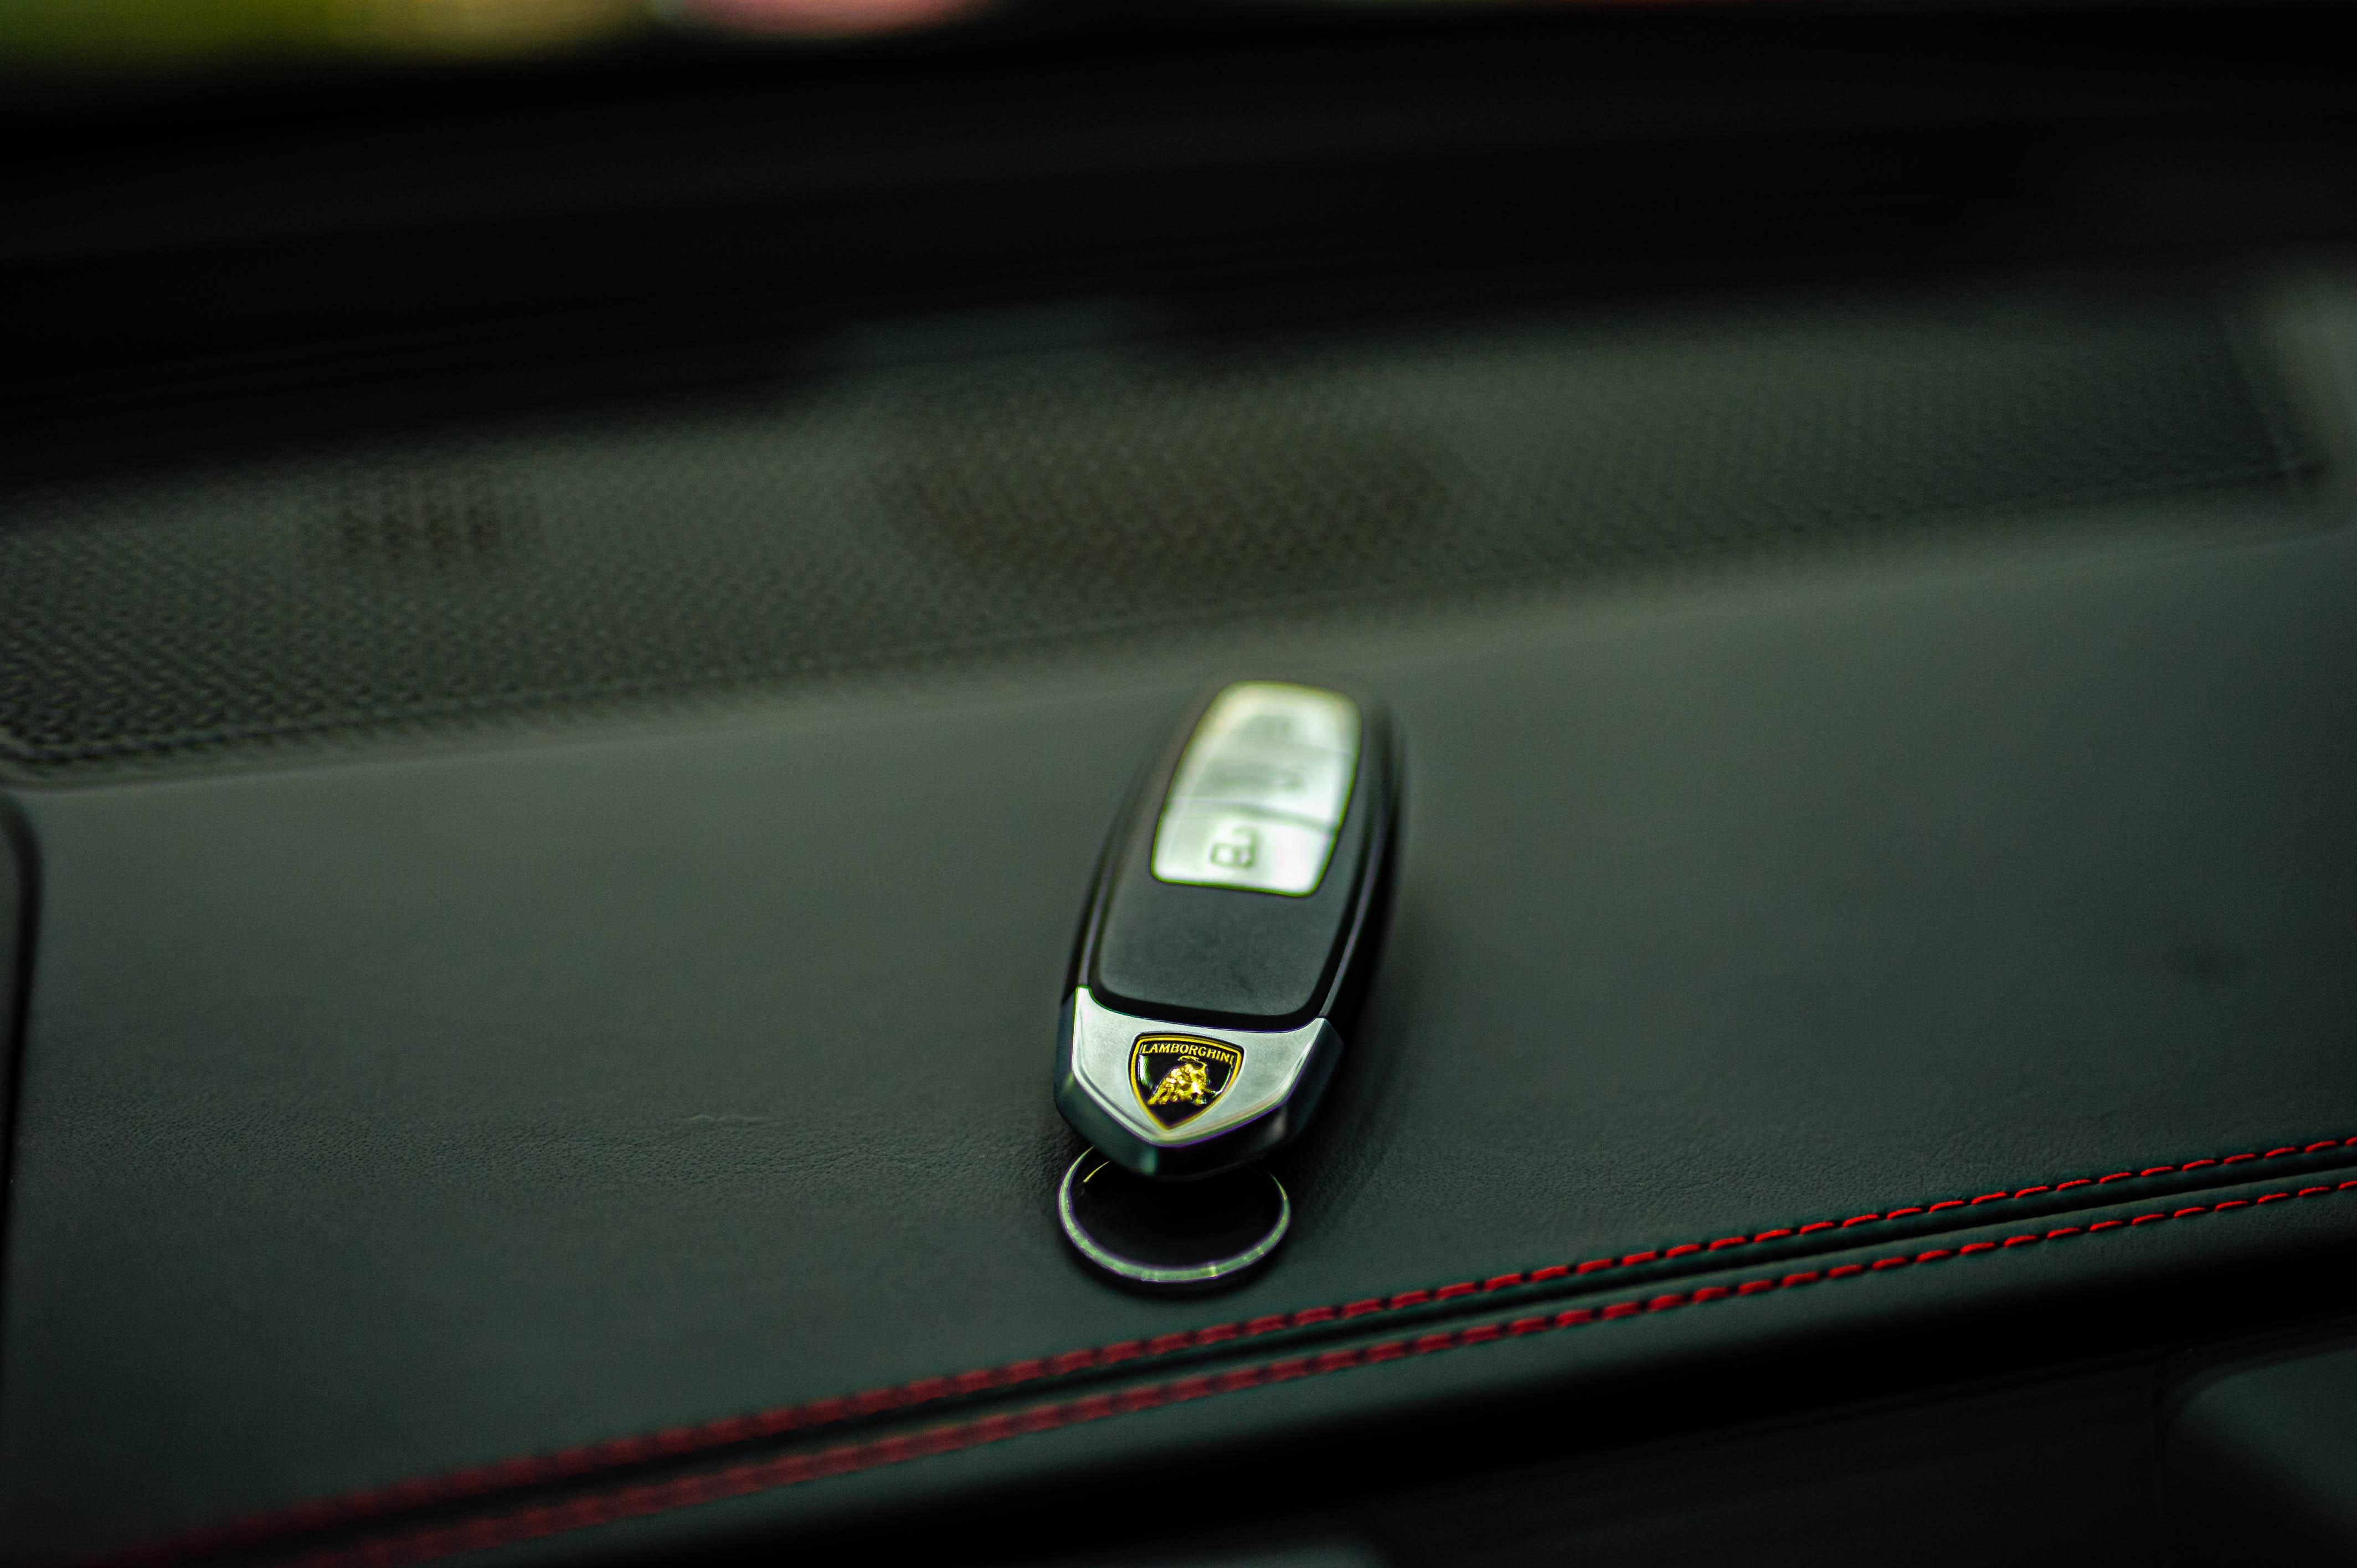 Ngam Lamborghini Urus mau den dau tien ve VN, gia khoang 1 trieu USD hinh anh 45 Urus_zing_63_.jpg